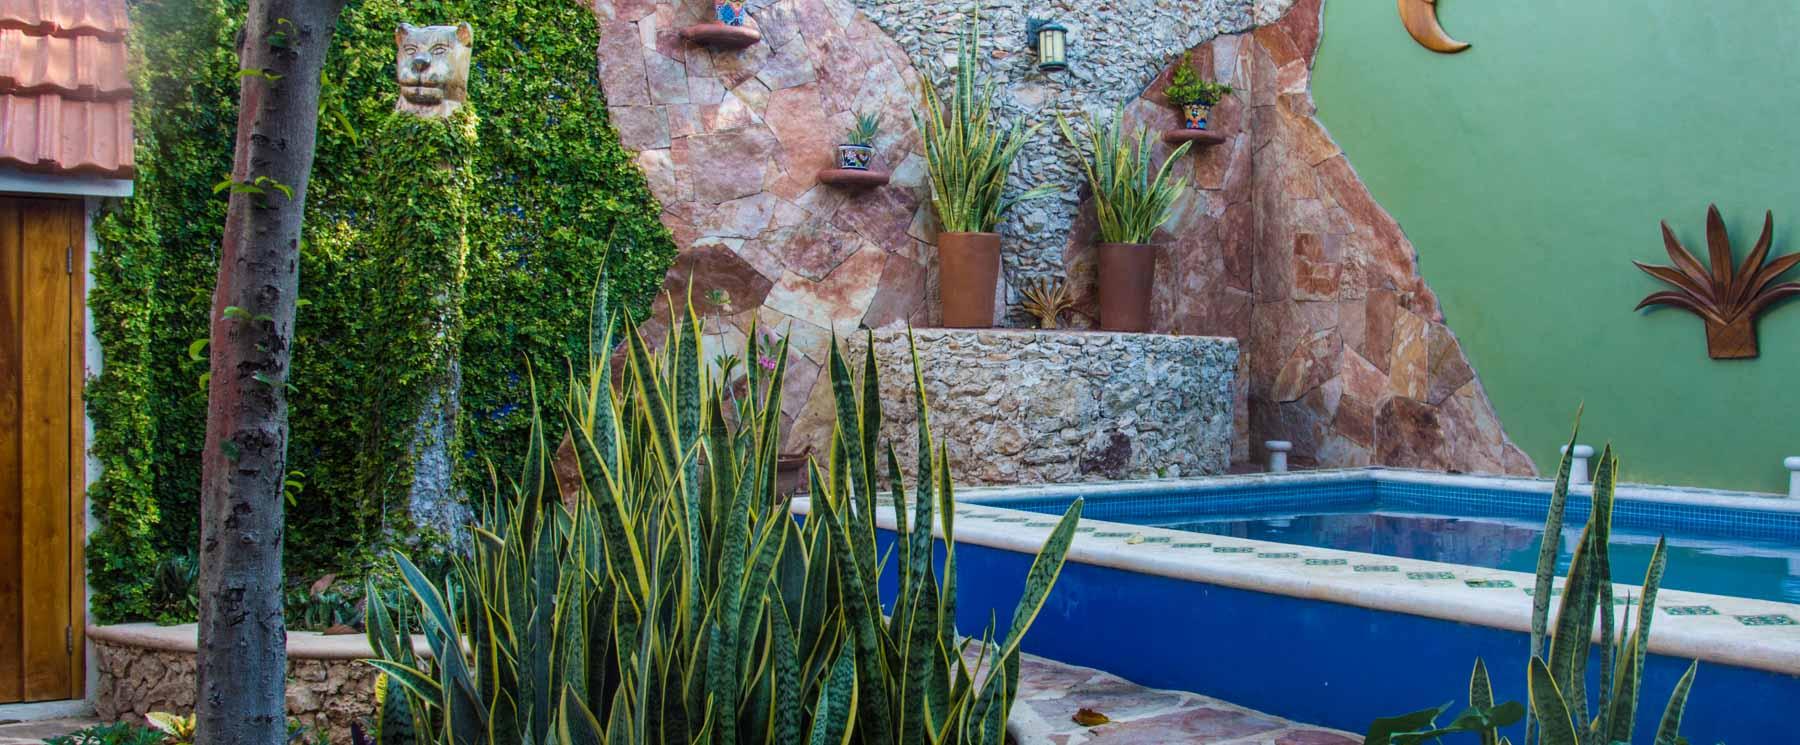 Backyard and swimming pool of Merida house.